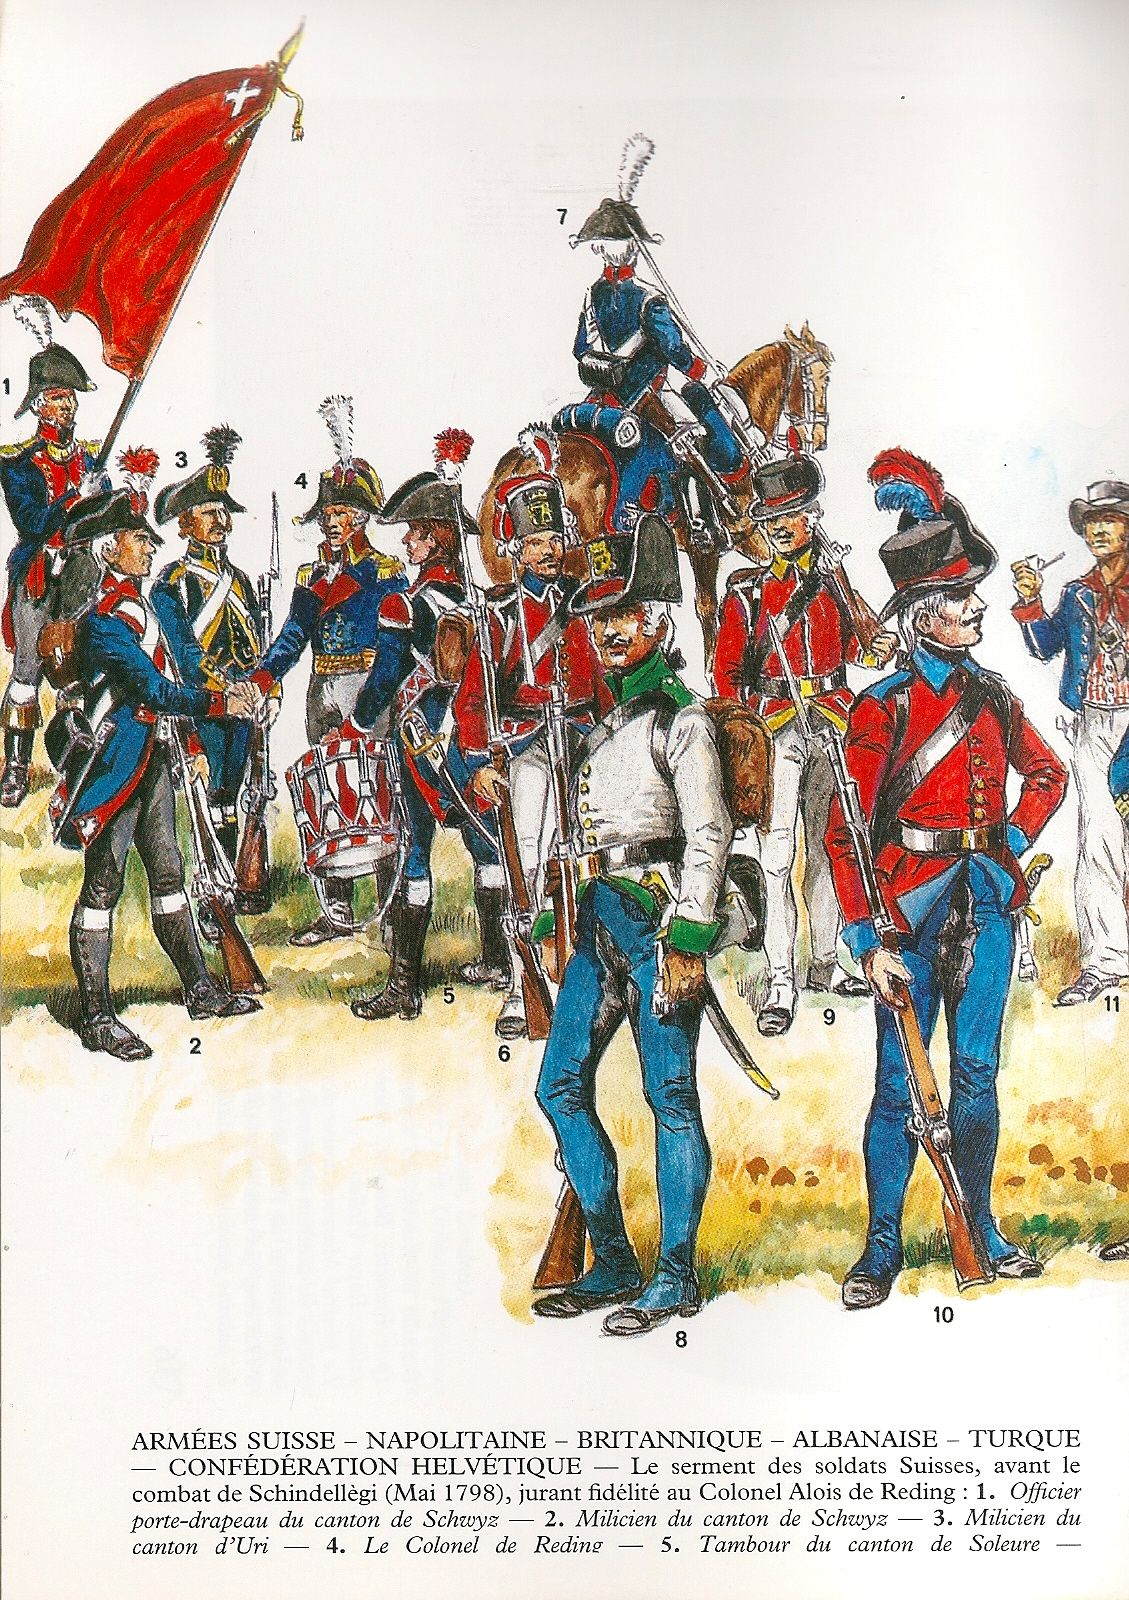 Armata Svizzera Napoletana Inglese Turca Albanese E Svizzera